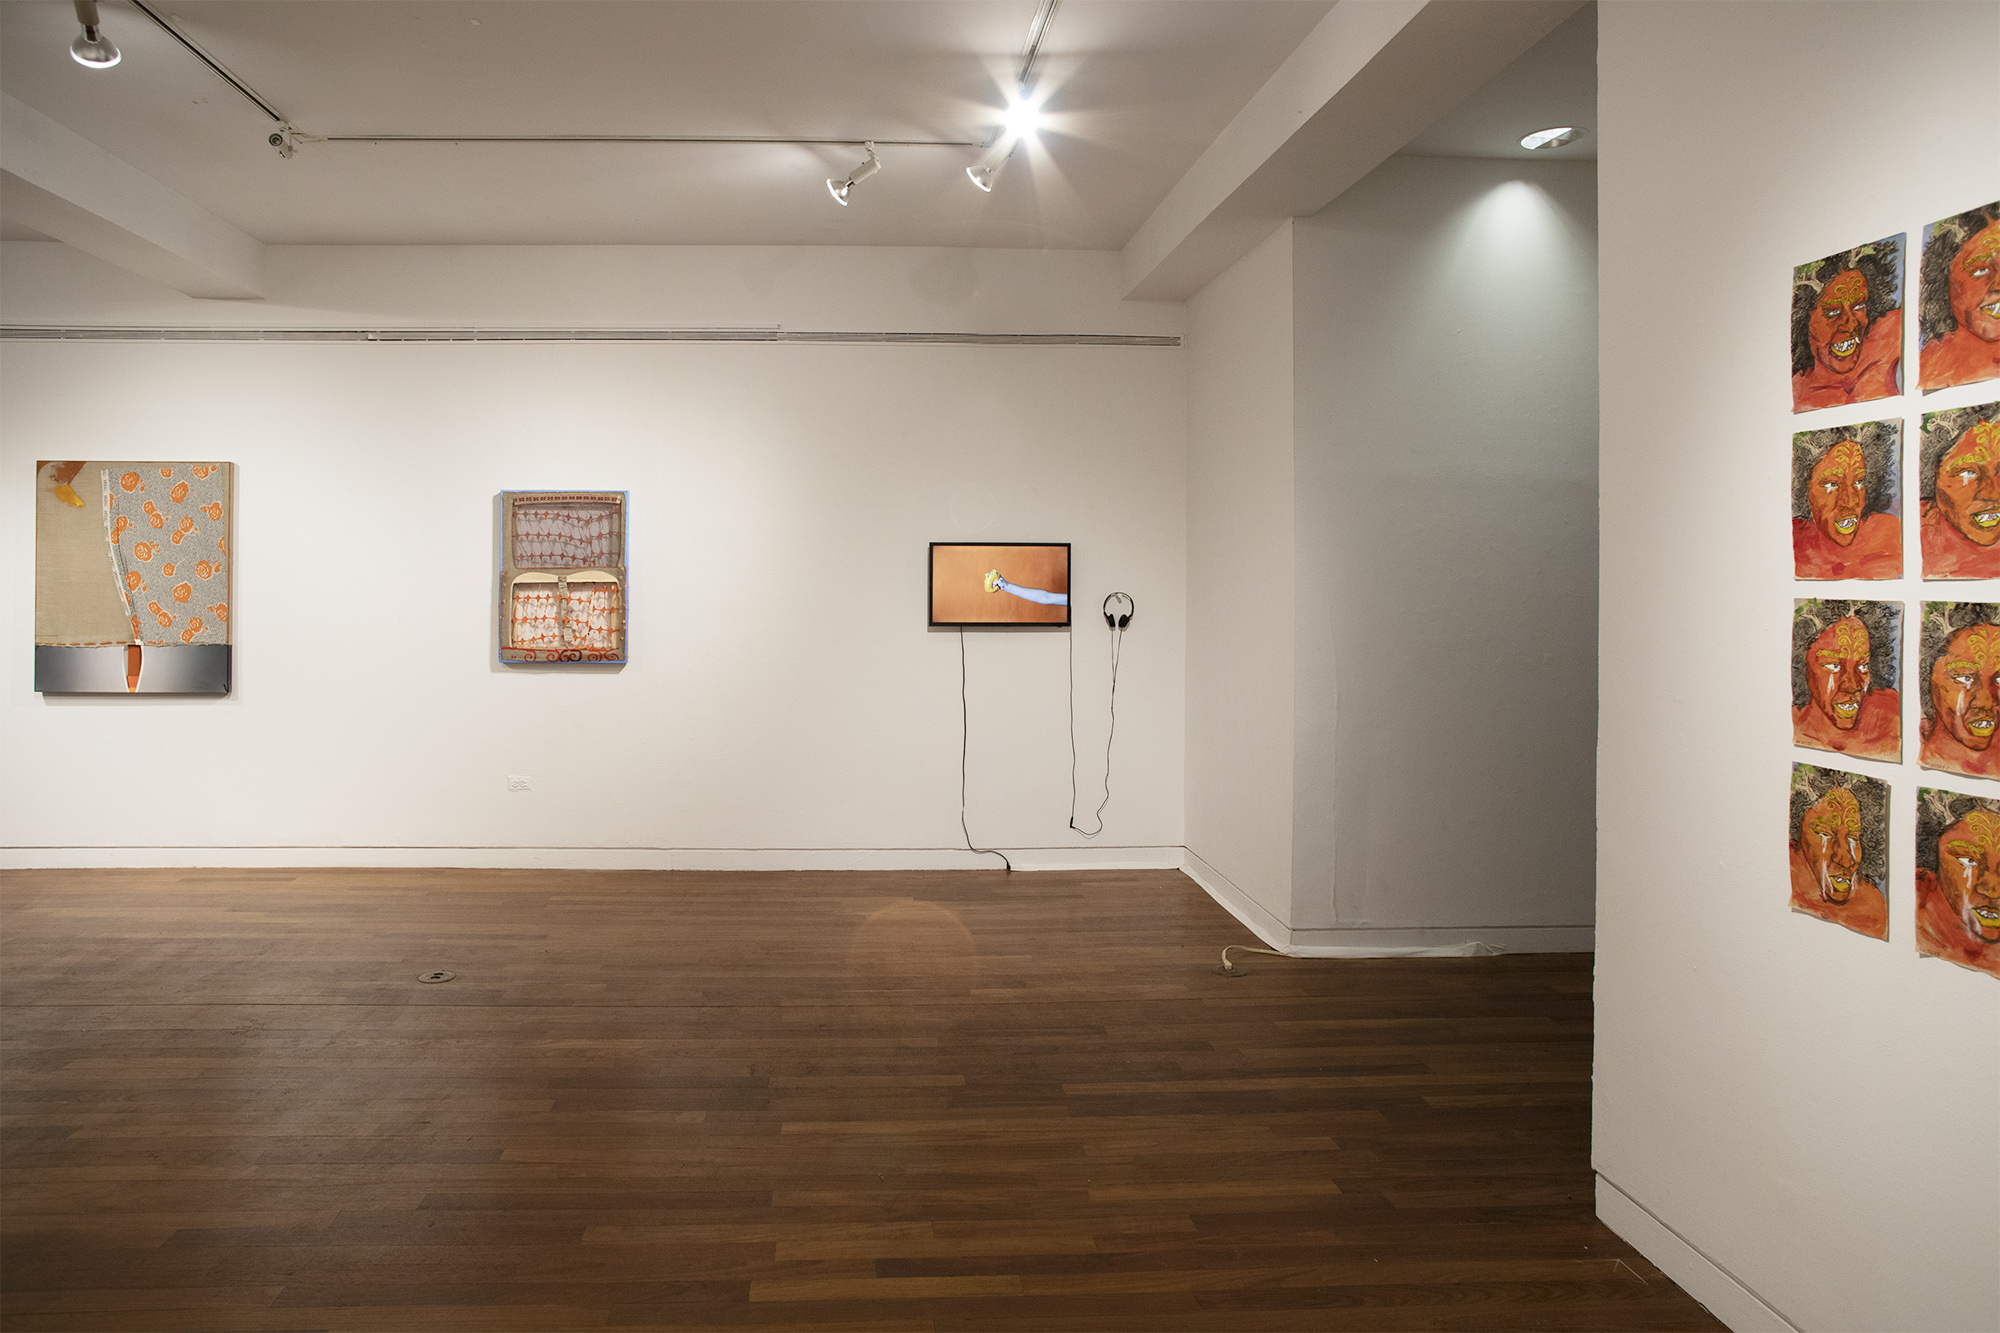 works by Tamar Ettun, Leeza Meksin, Kiyomi Quinn Taylor